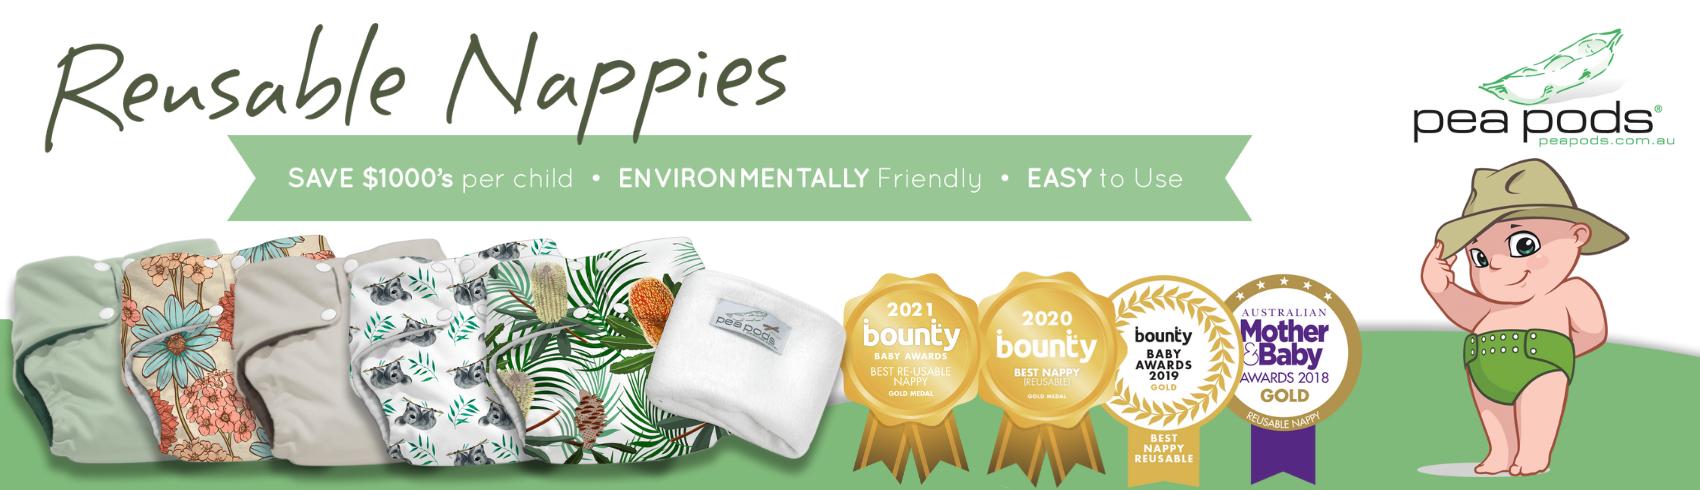 Reusable Nappies - Pea Pods Australia